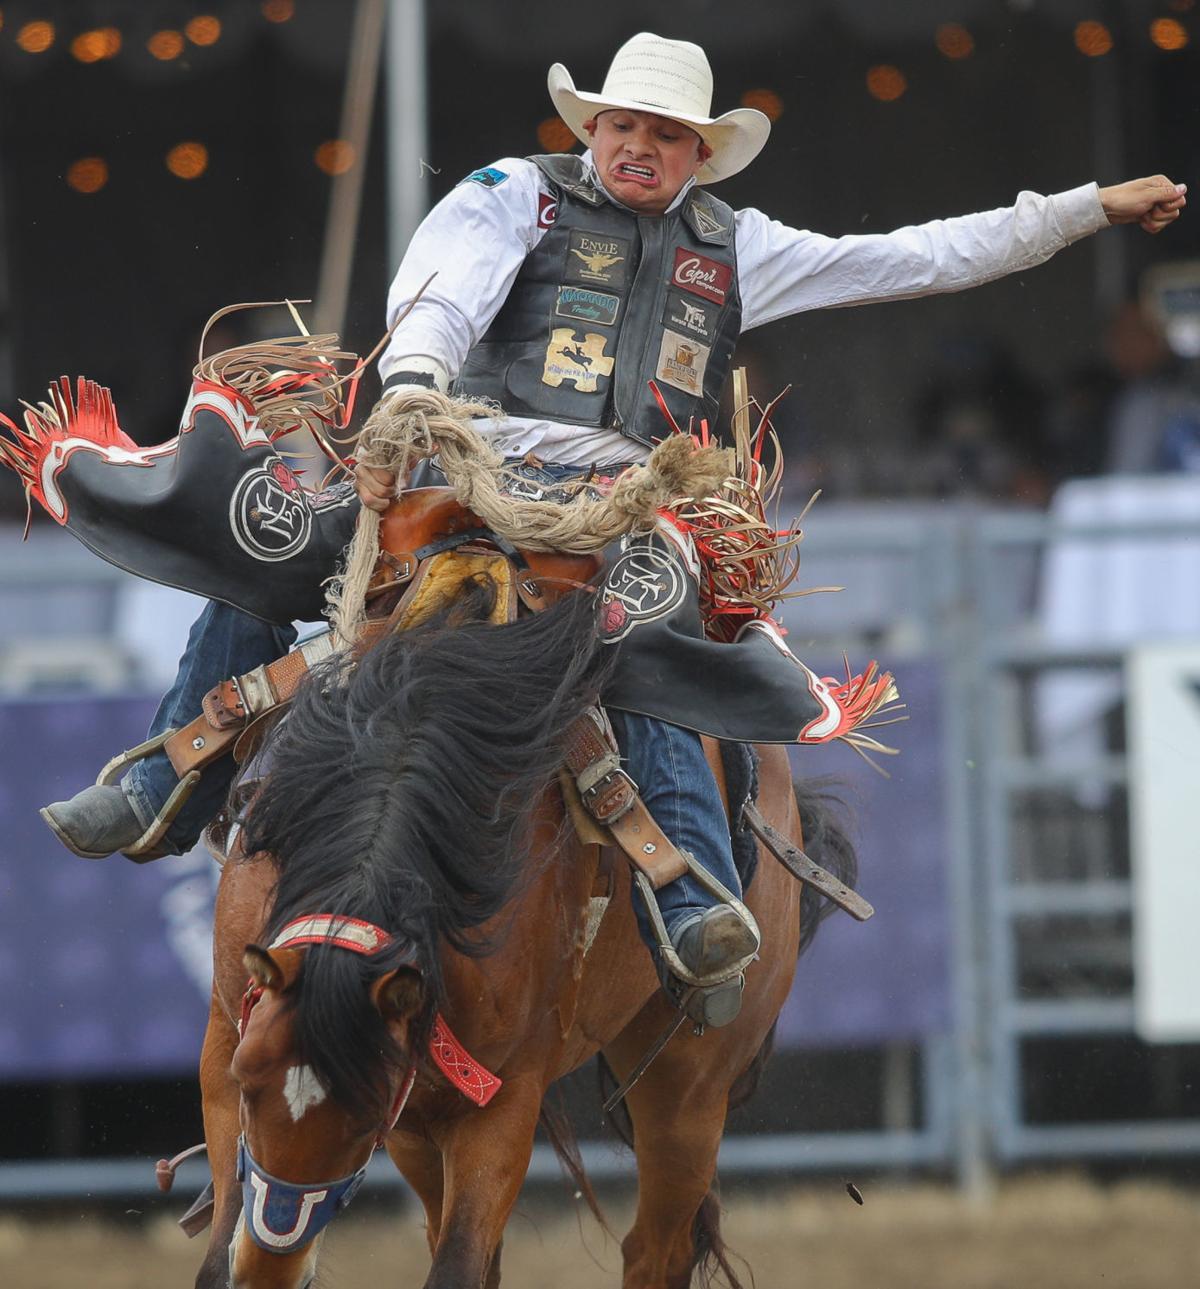 060219 Elks Rodeo Sunday 01.jpg